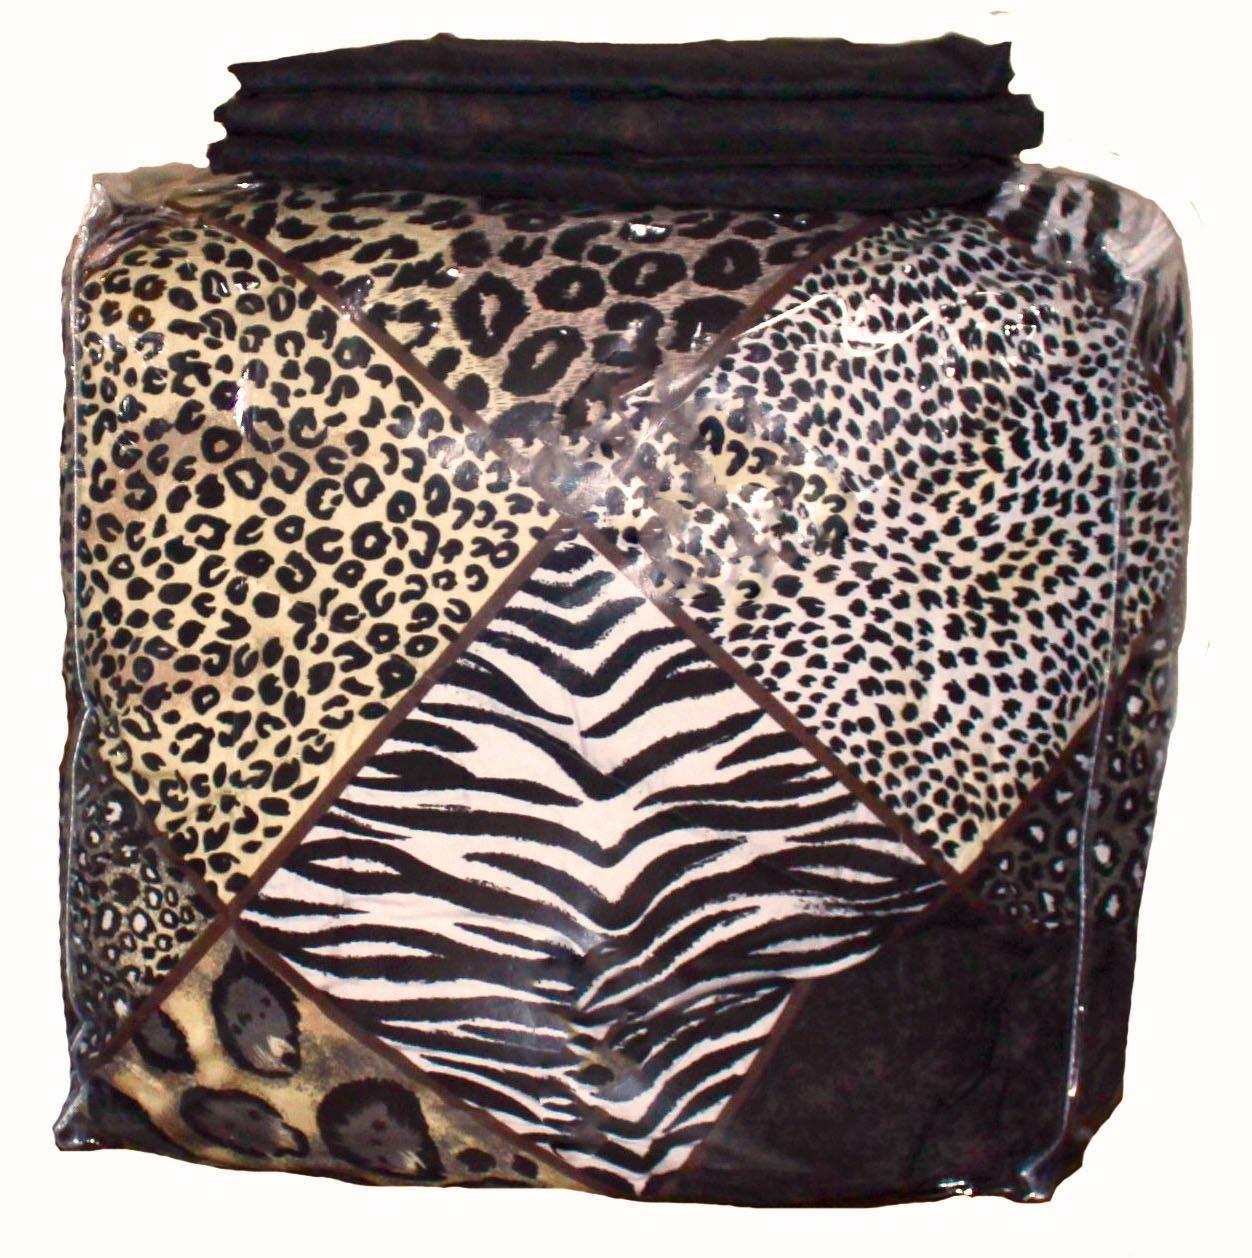 Martha's Mixed Bag Safari Animal Print Brown Patchwork Comforter Set with Sheets Jaguar Leopard Zebra (8pc Full Size 76'' x 86'') by Martha's Mixed Bag